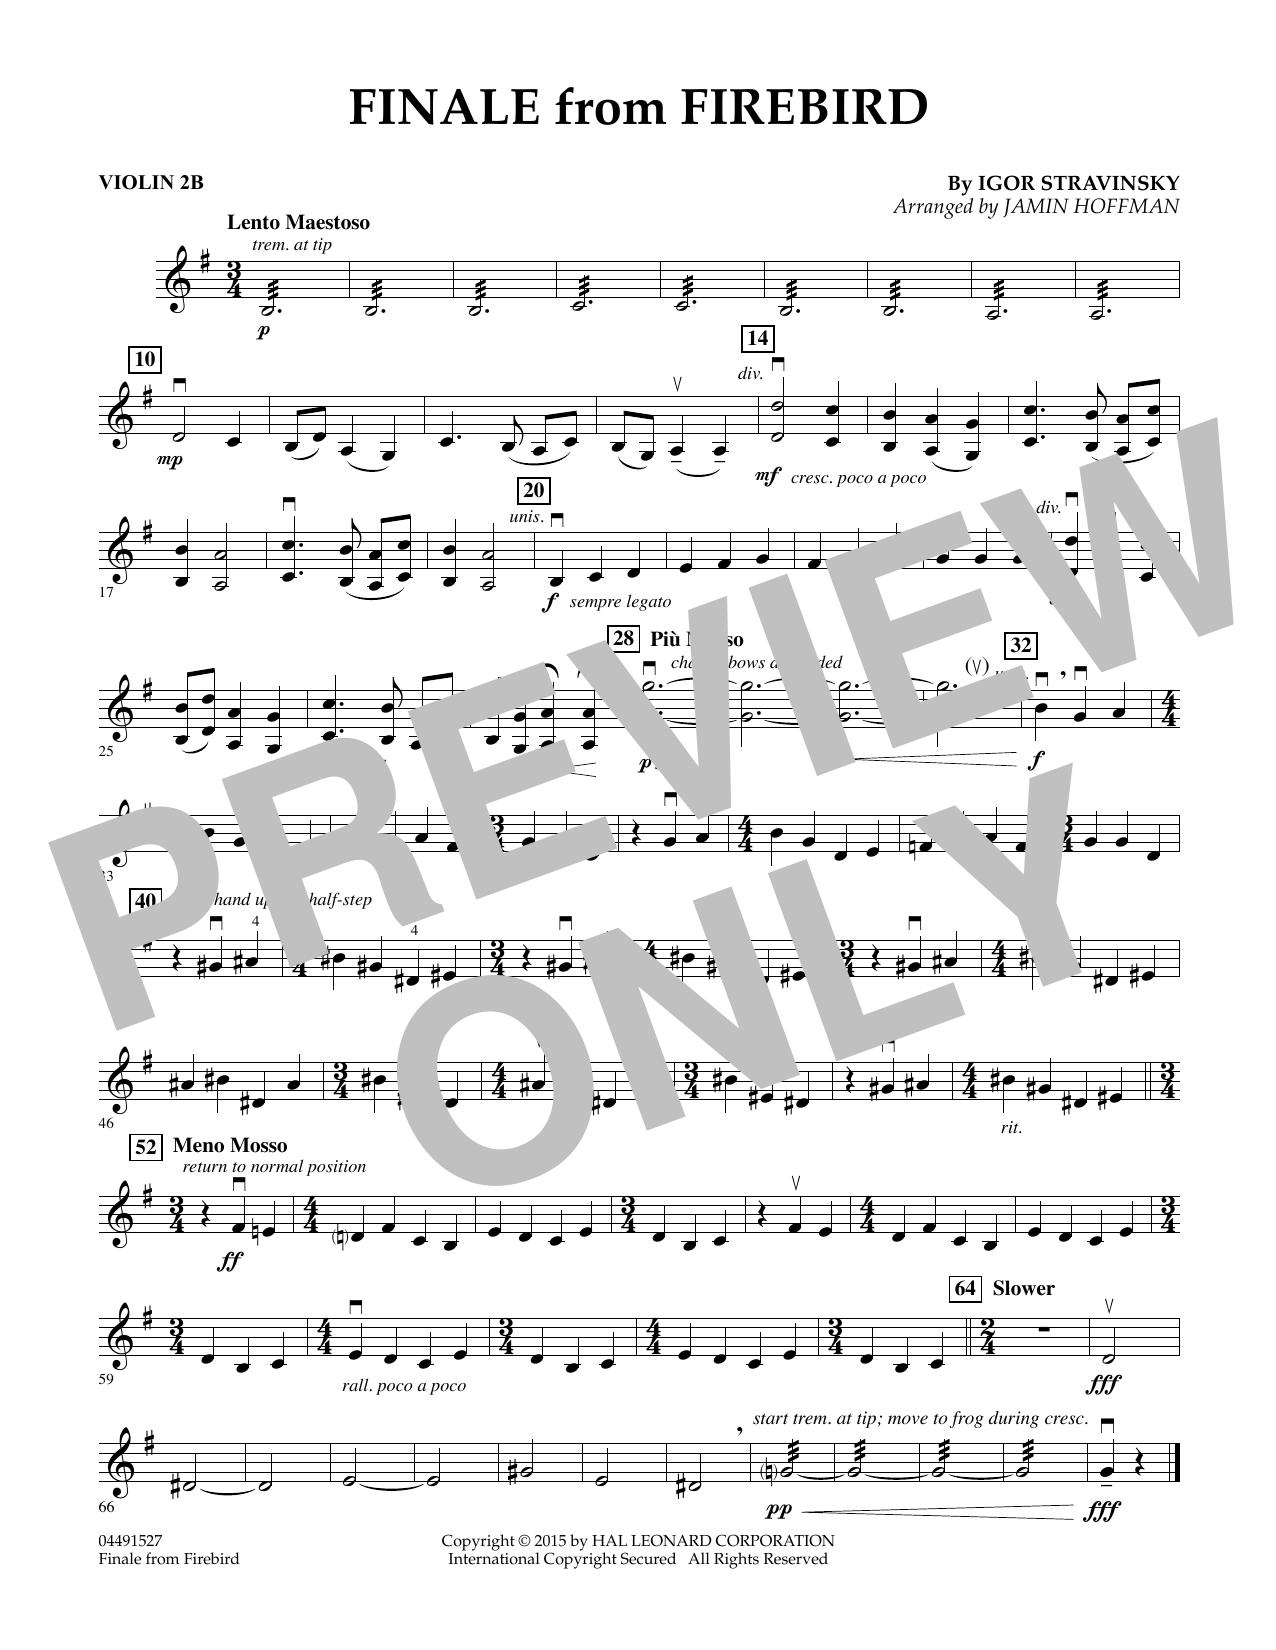 Finale from Firebird (arr. Jamin Hoffman) - Violin 2B (Orchestra)